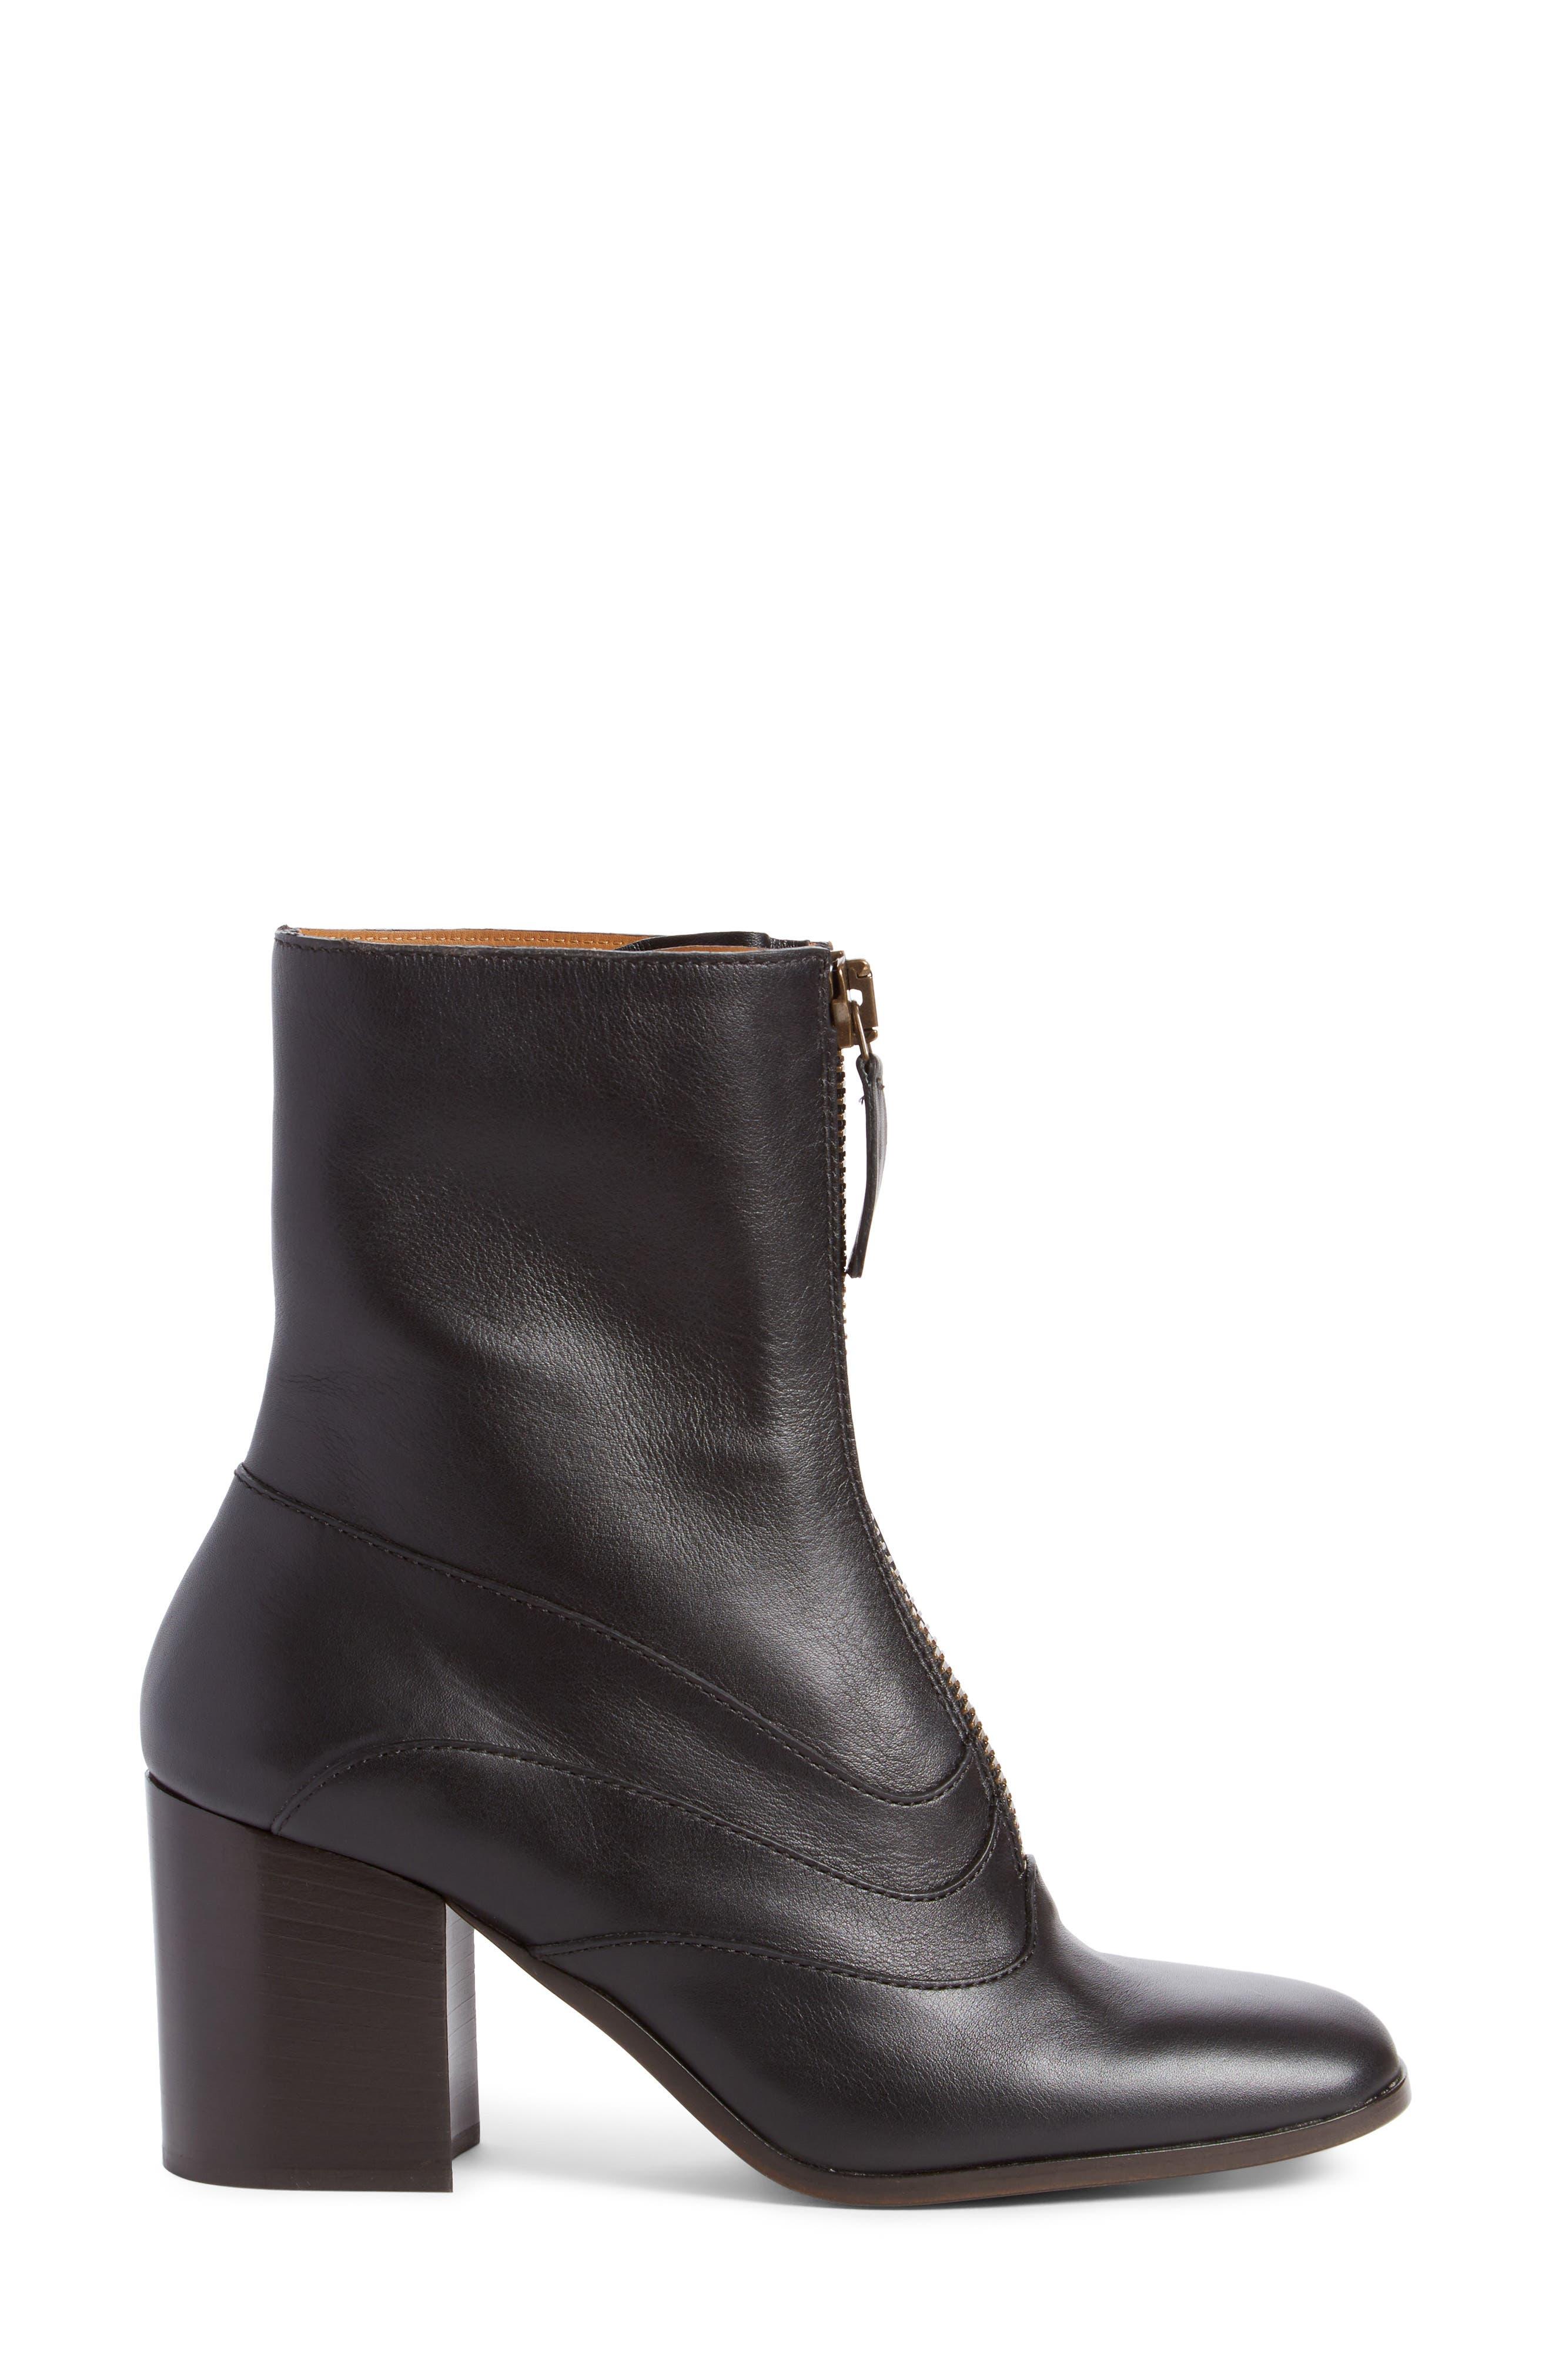 Qacey Square Toe Boot,                             Alternate thumbnail 4, color,                             Black